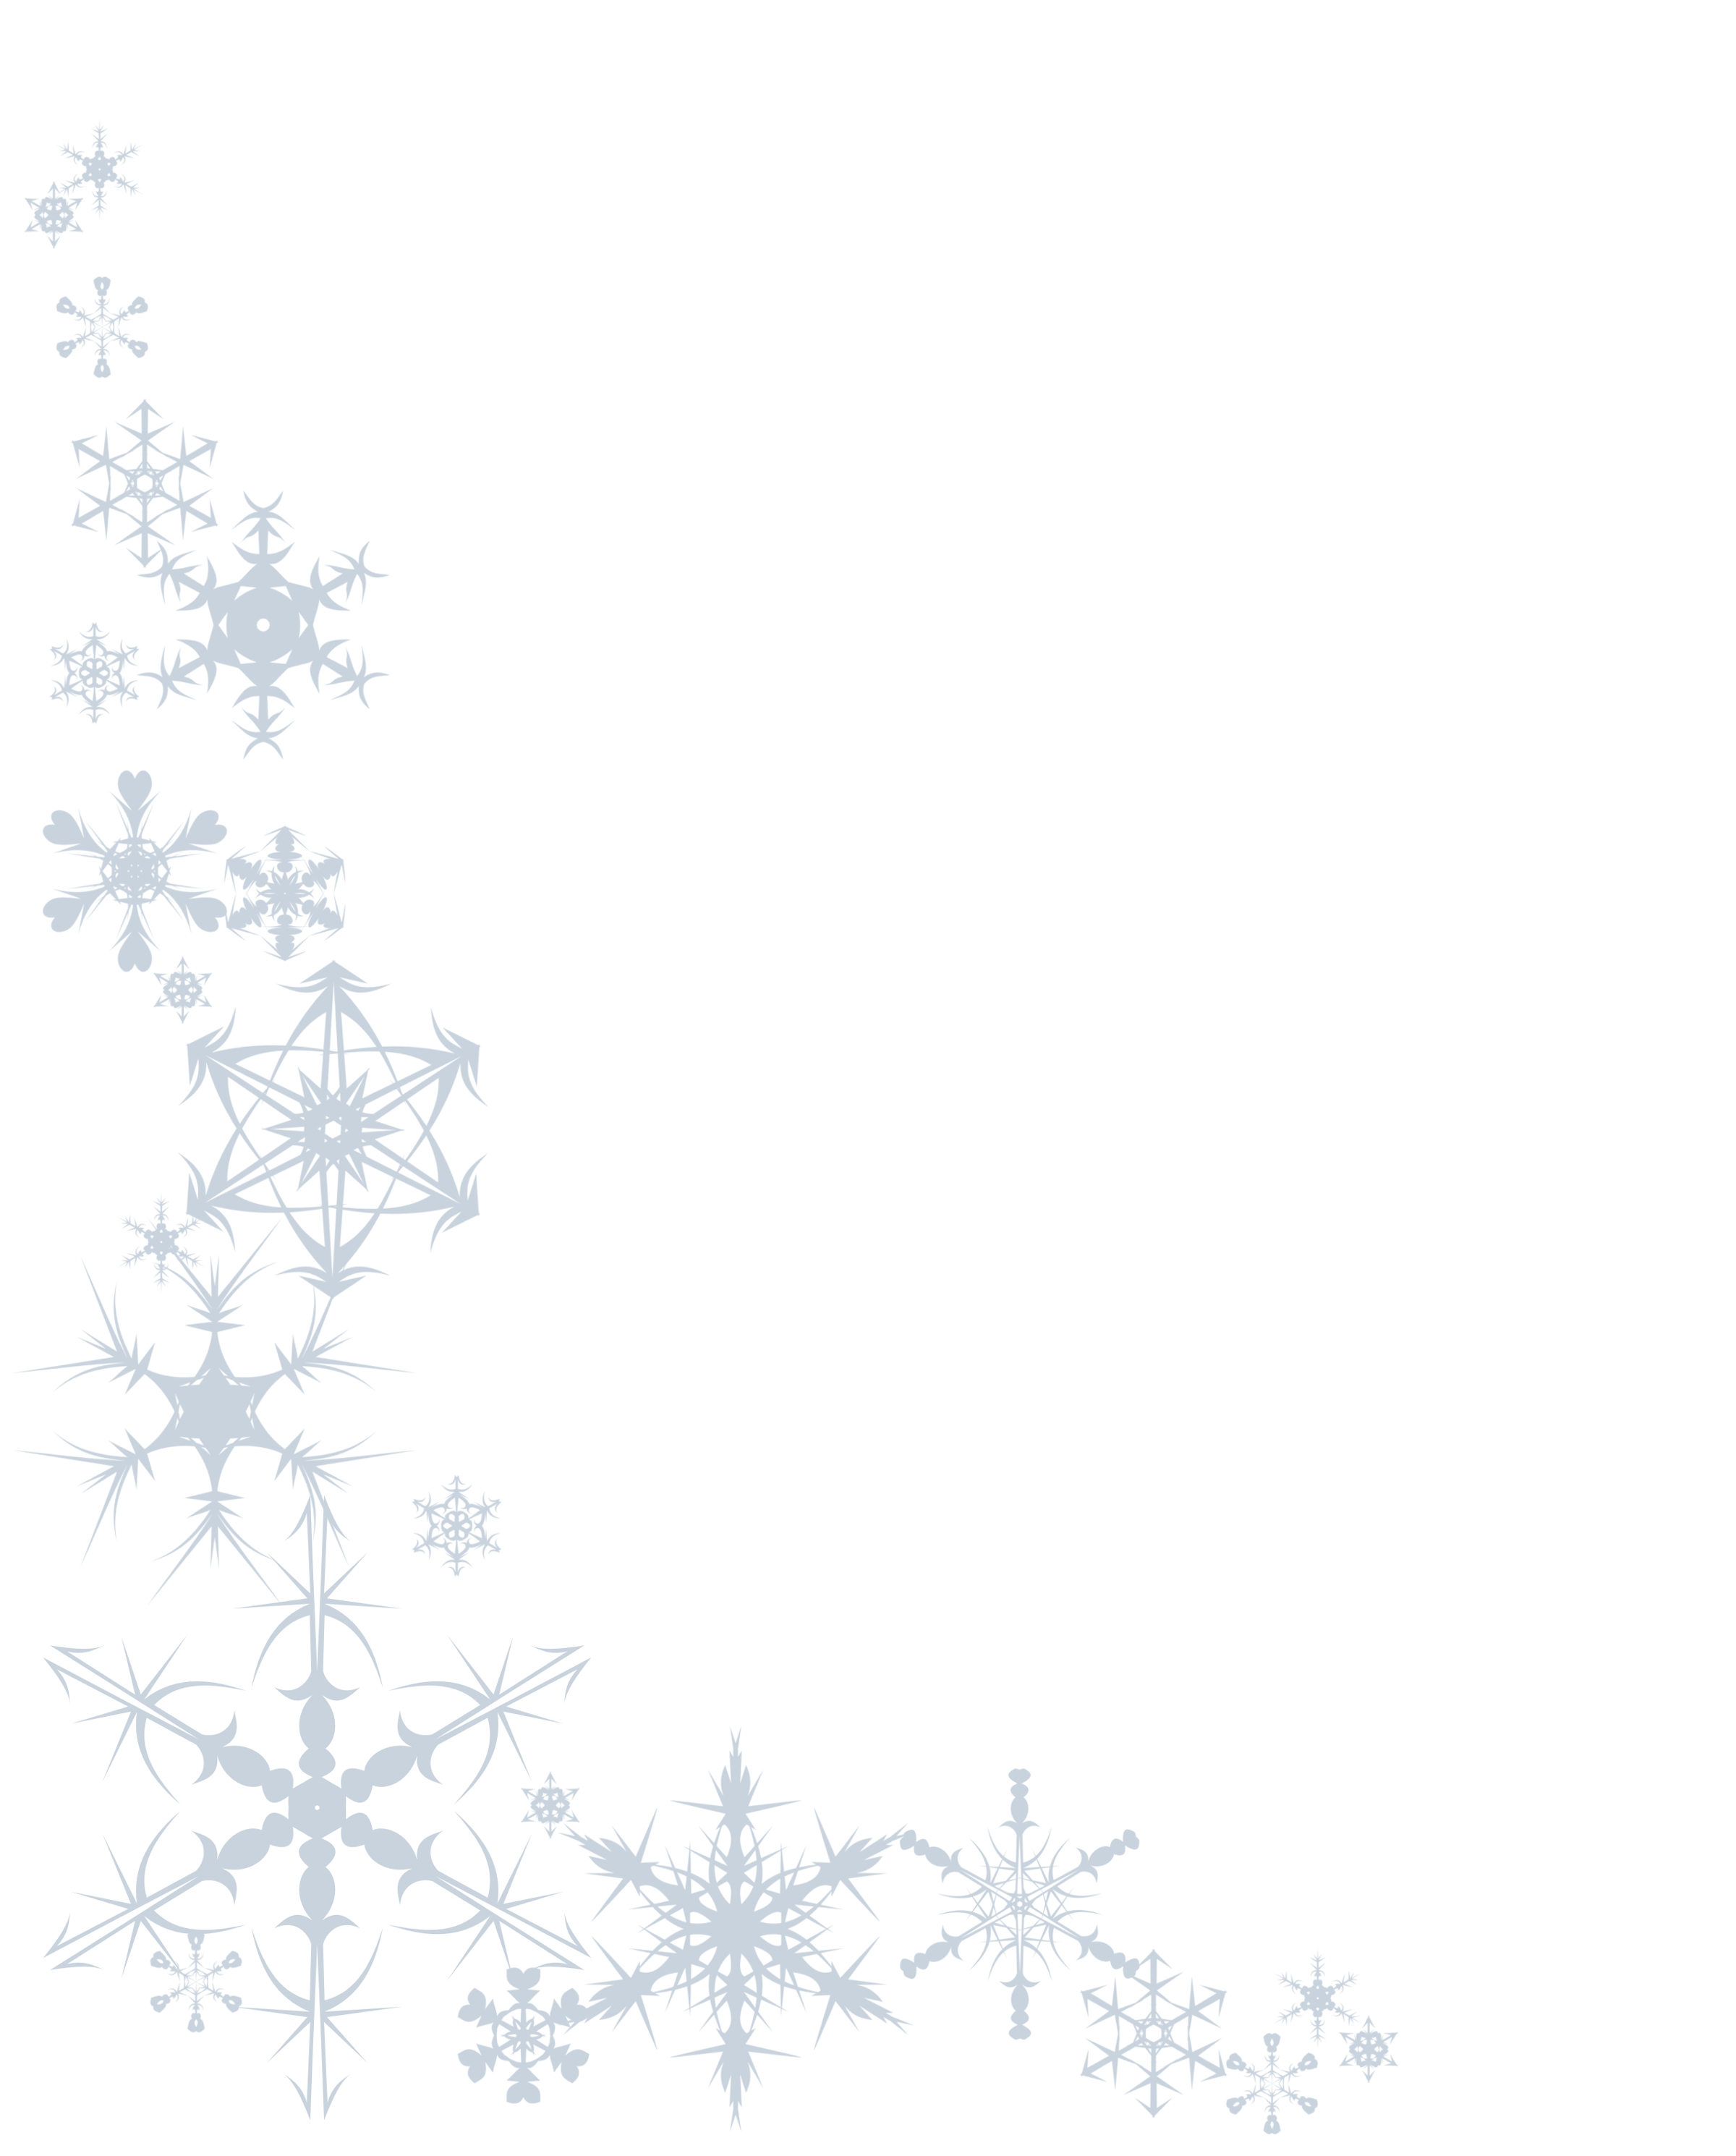 Christmas Snowflake Clipart Border 20 Free Cliparts